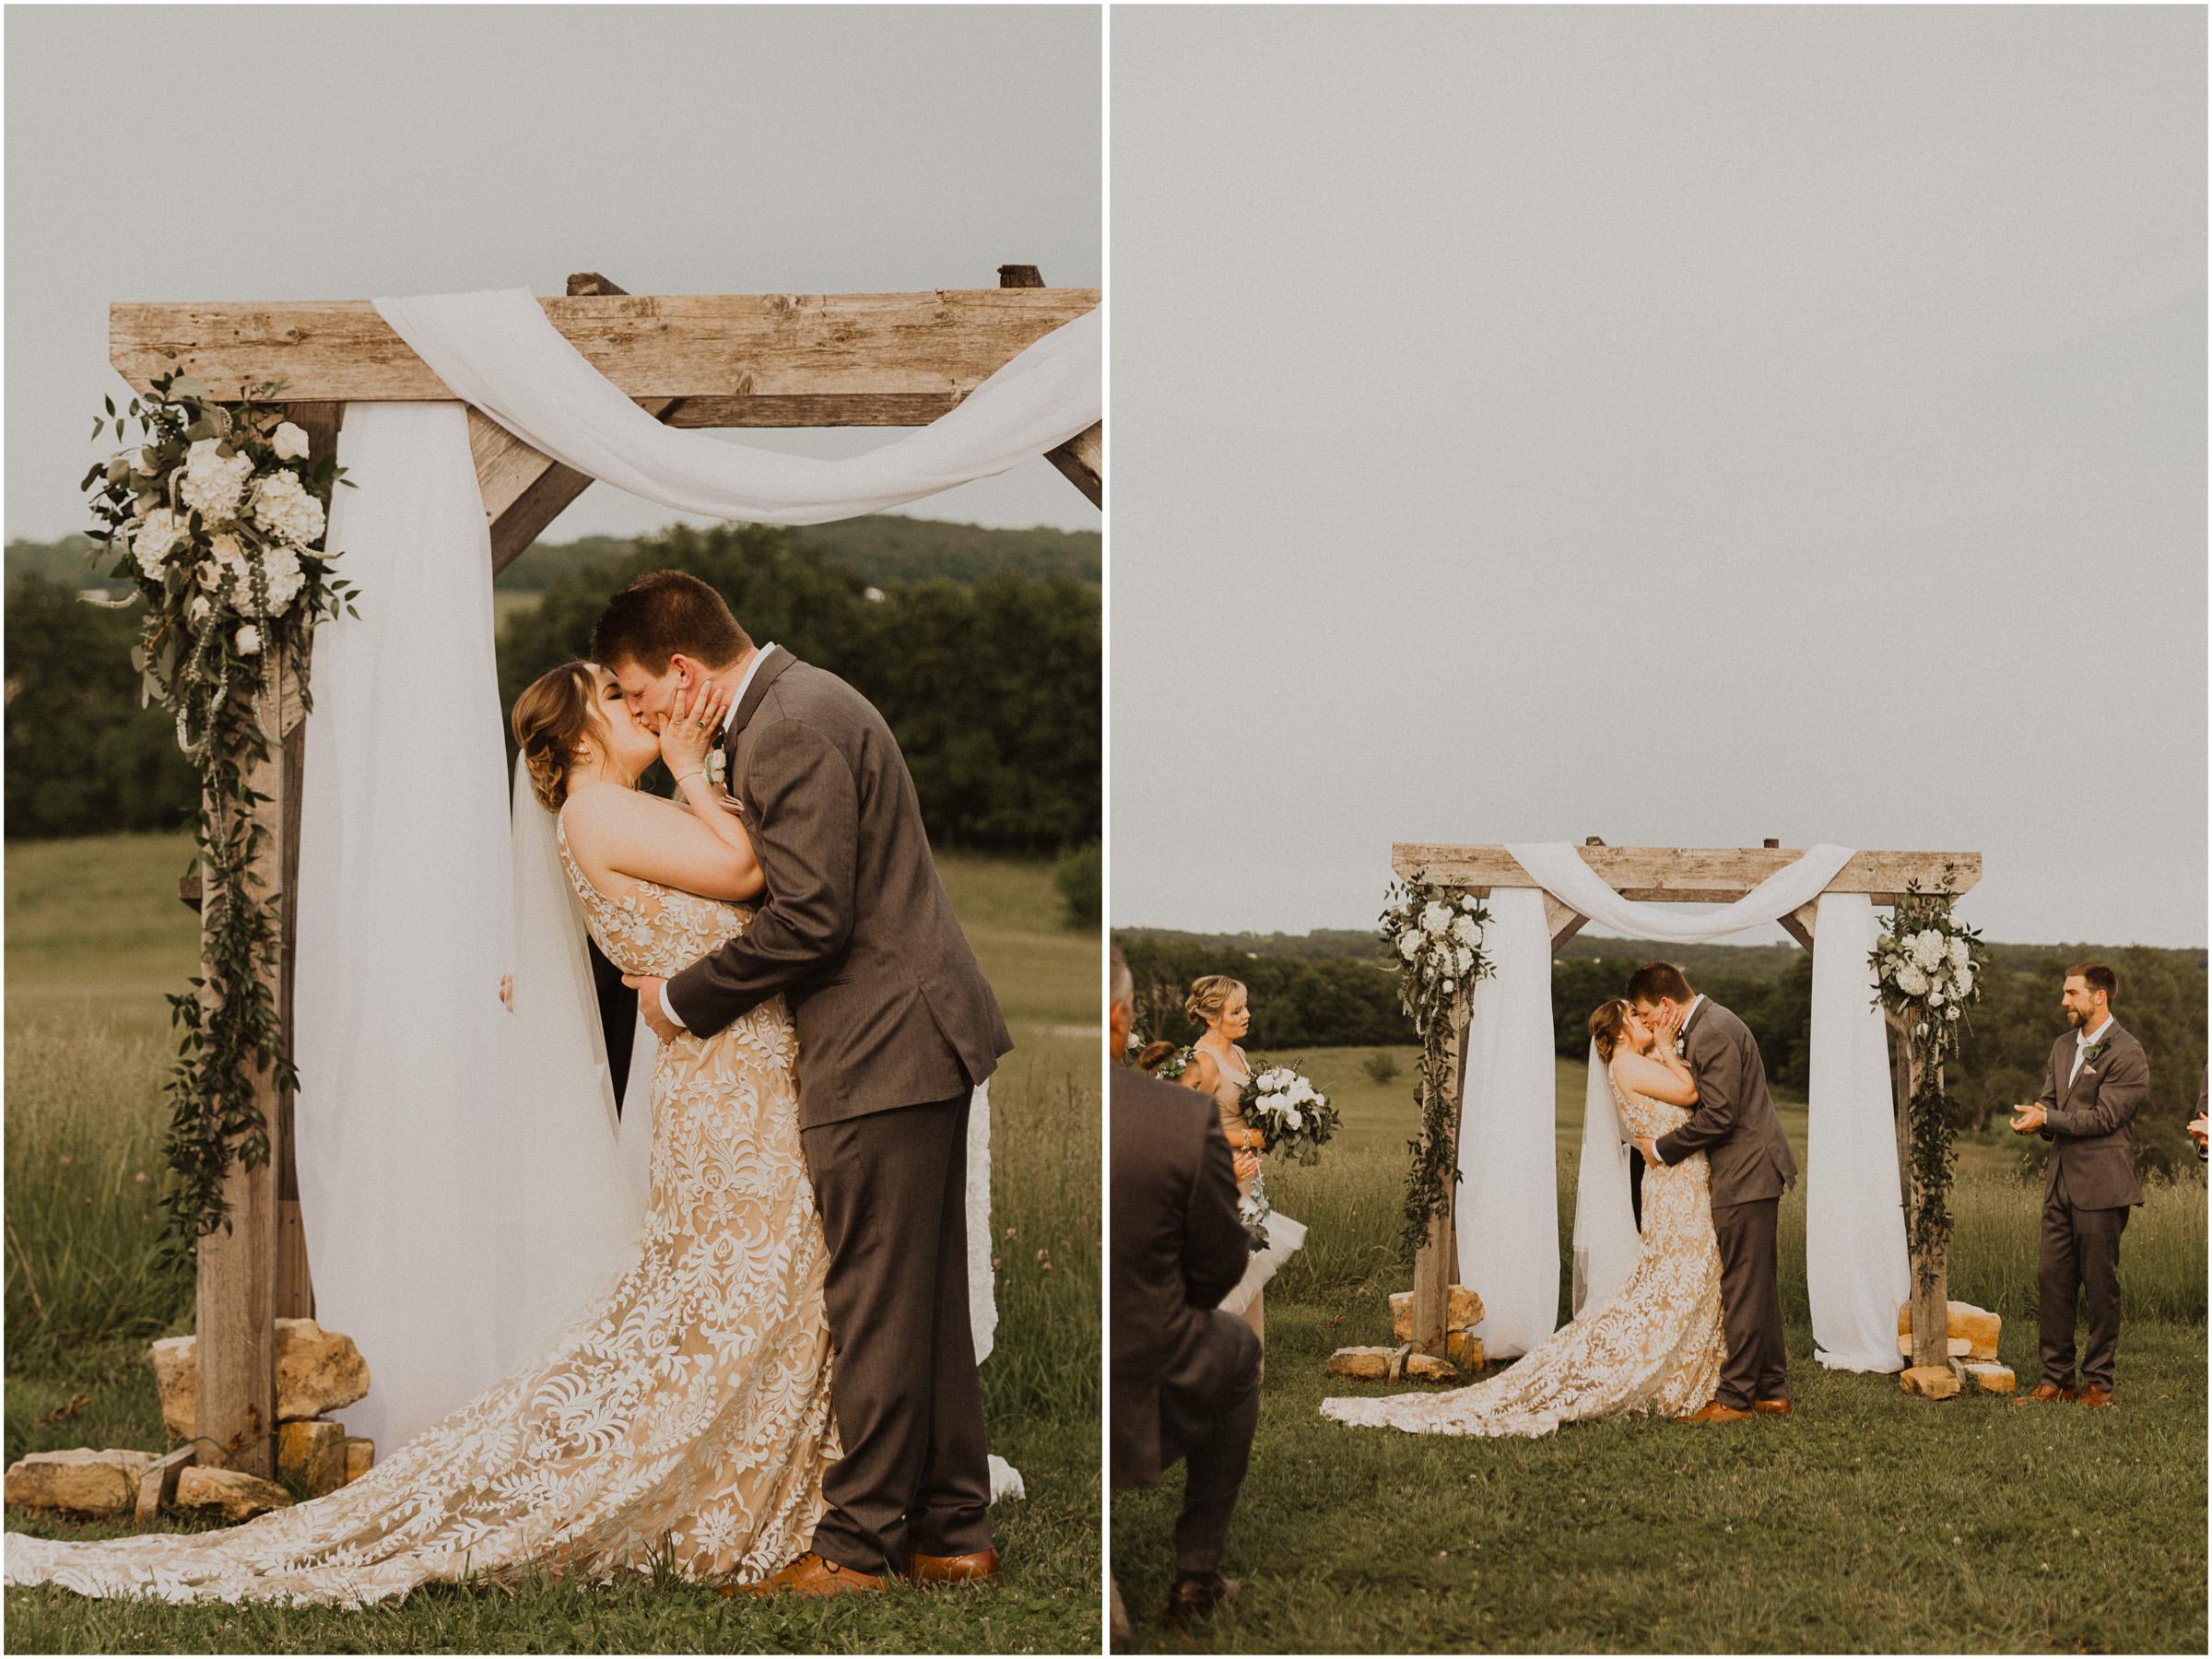 alyssa barletter photography weston red barn farm timberbarn summer outdoor wedding-46.jpg